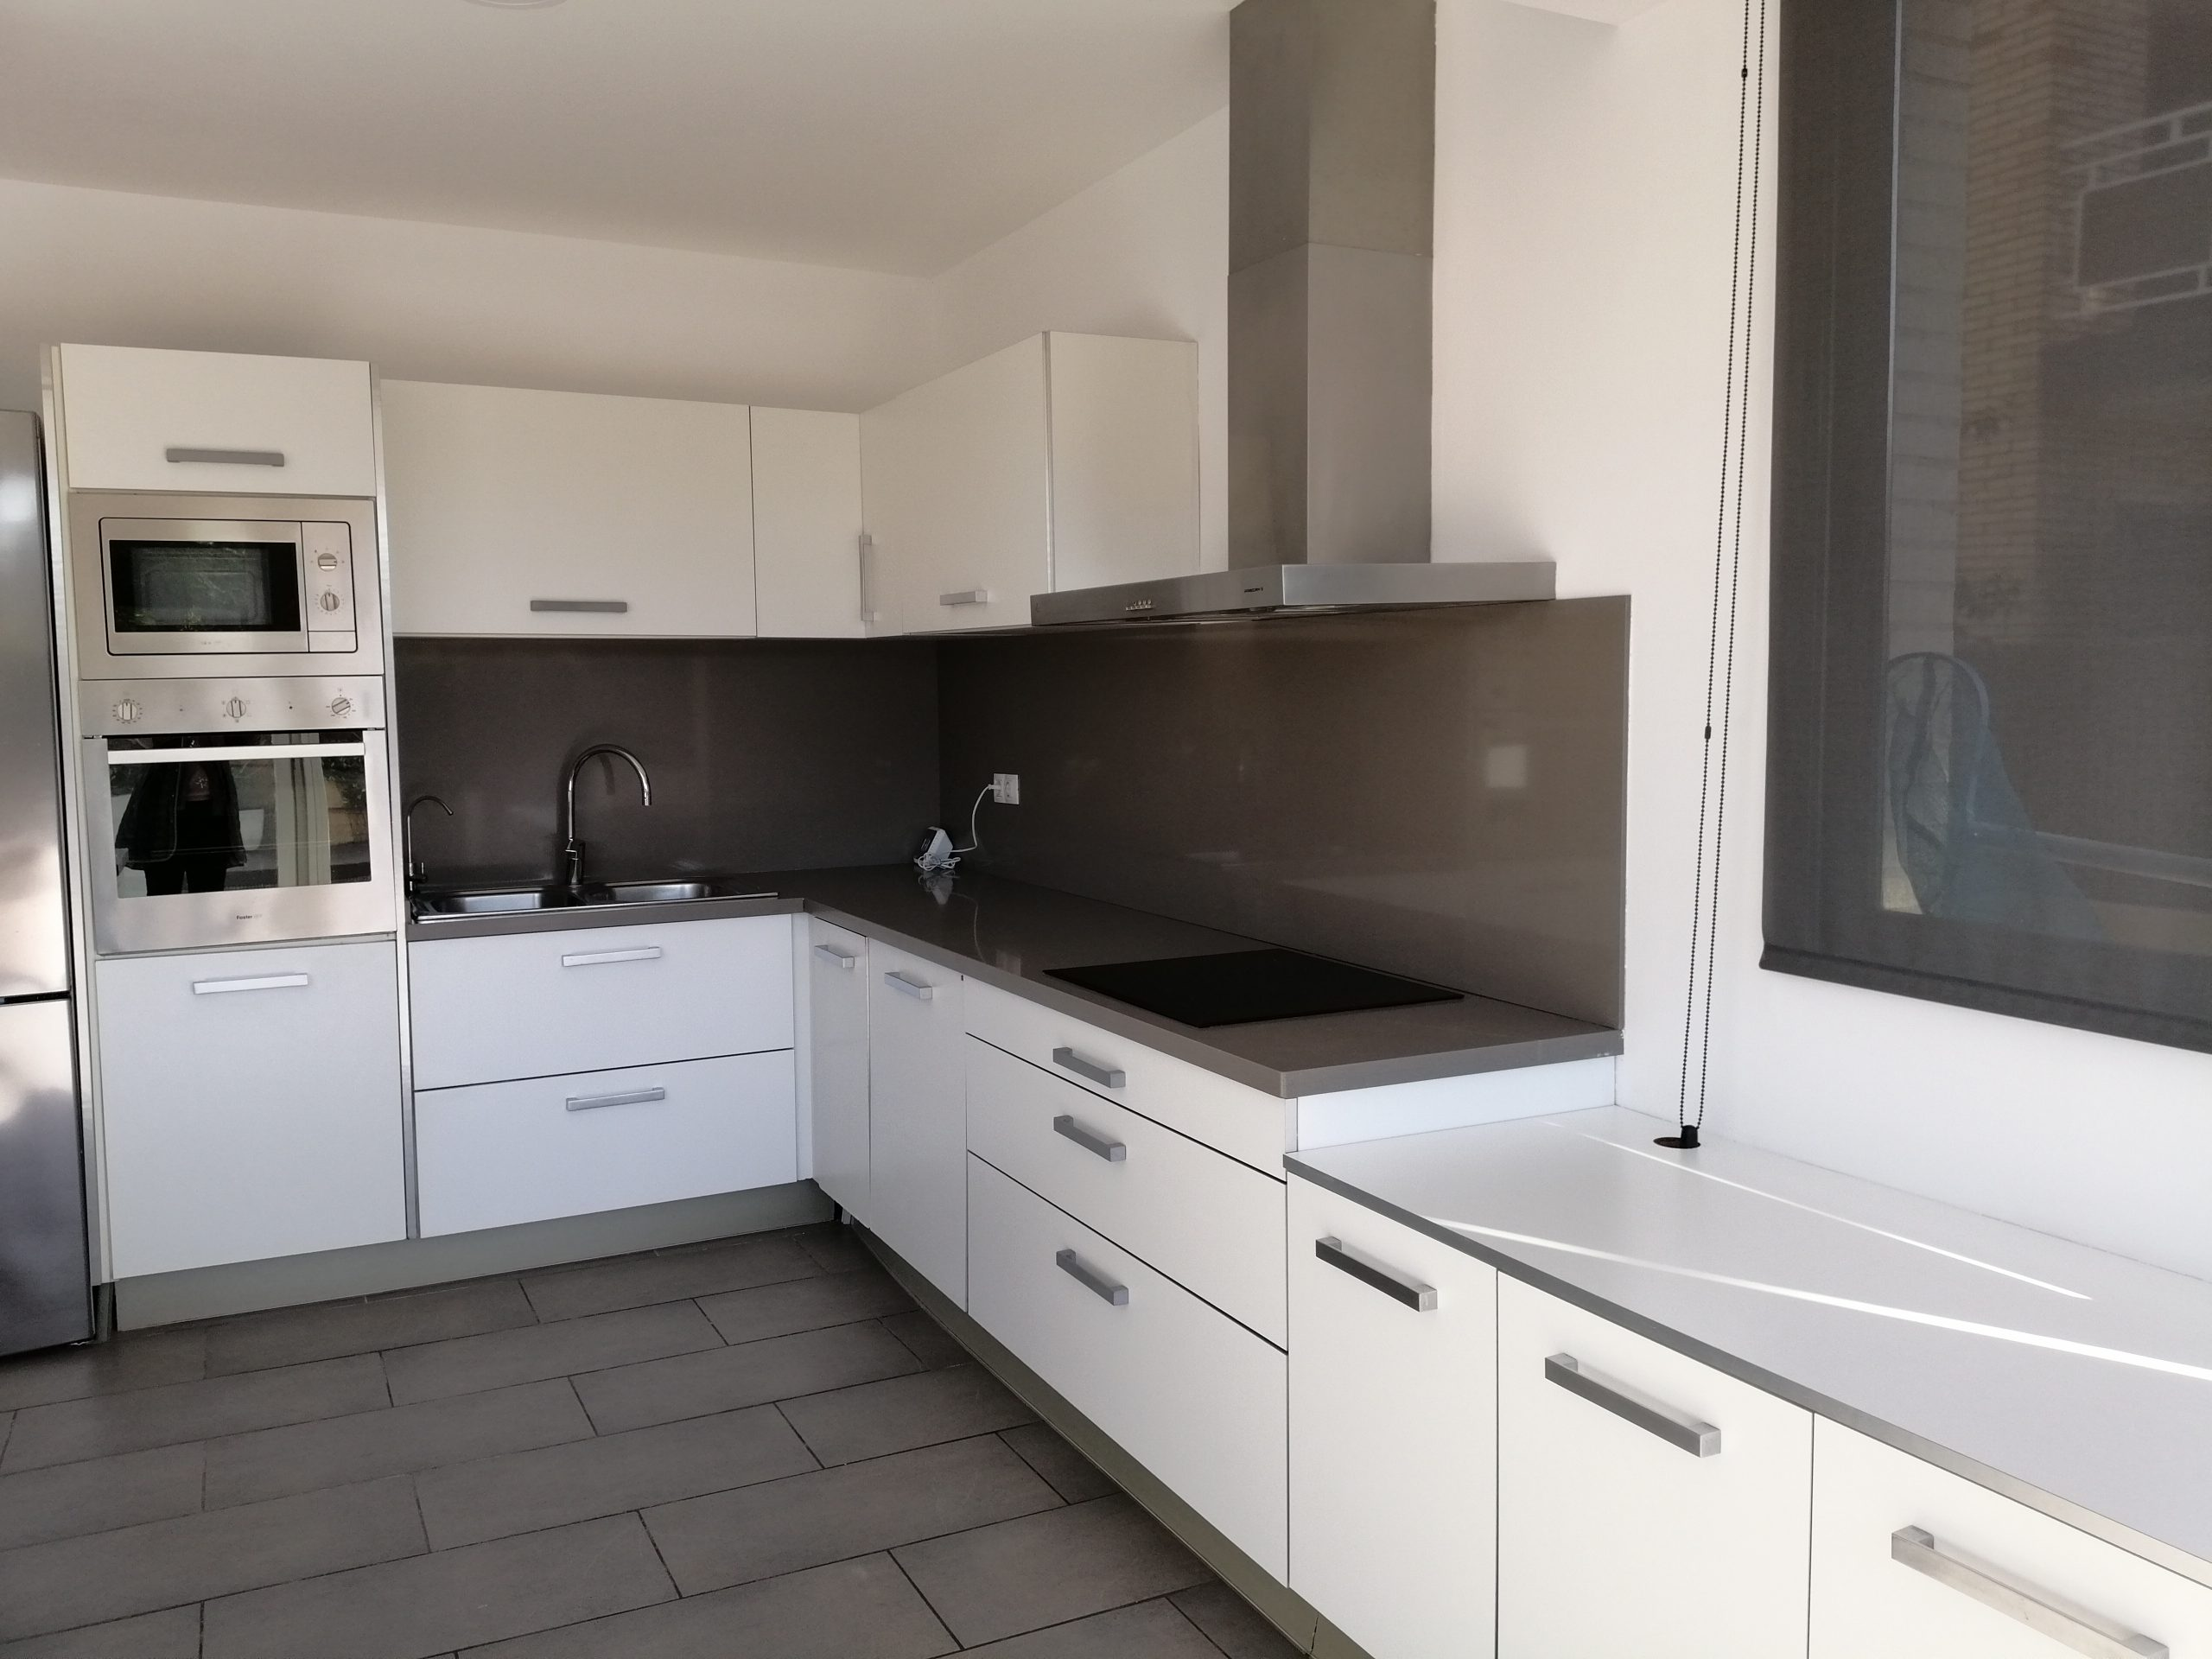 Casa o chalet independiente en venta en Urb. CAN BOU, Can Bou